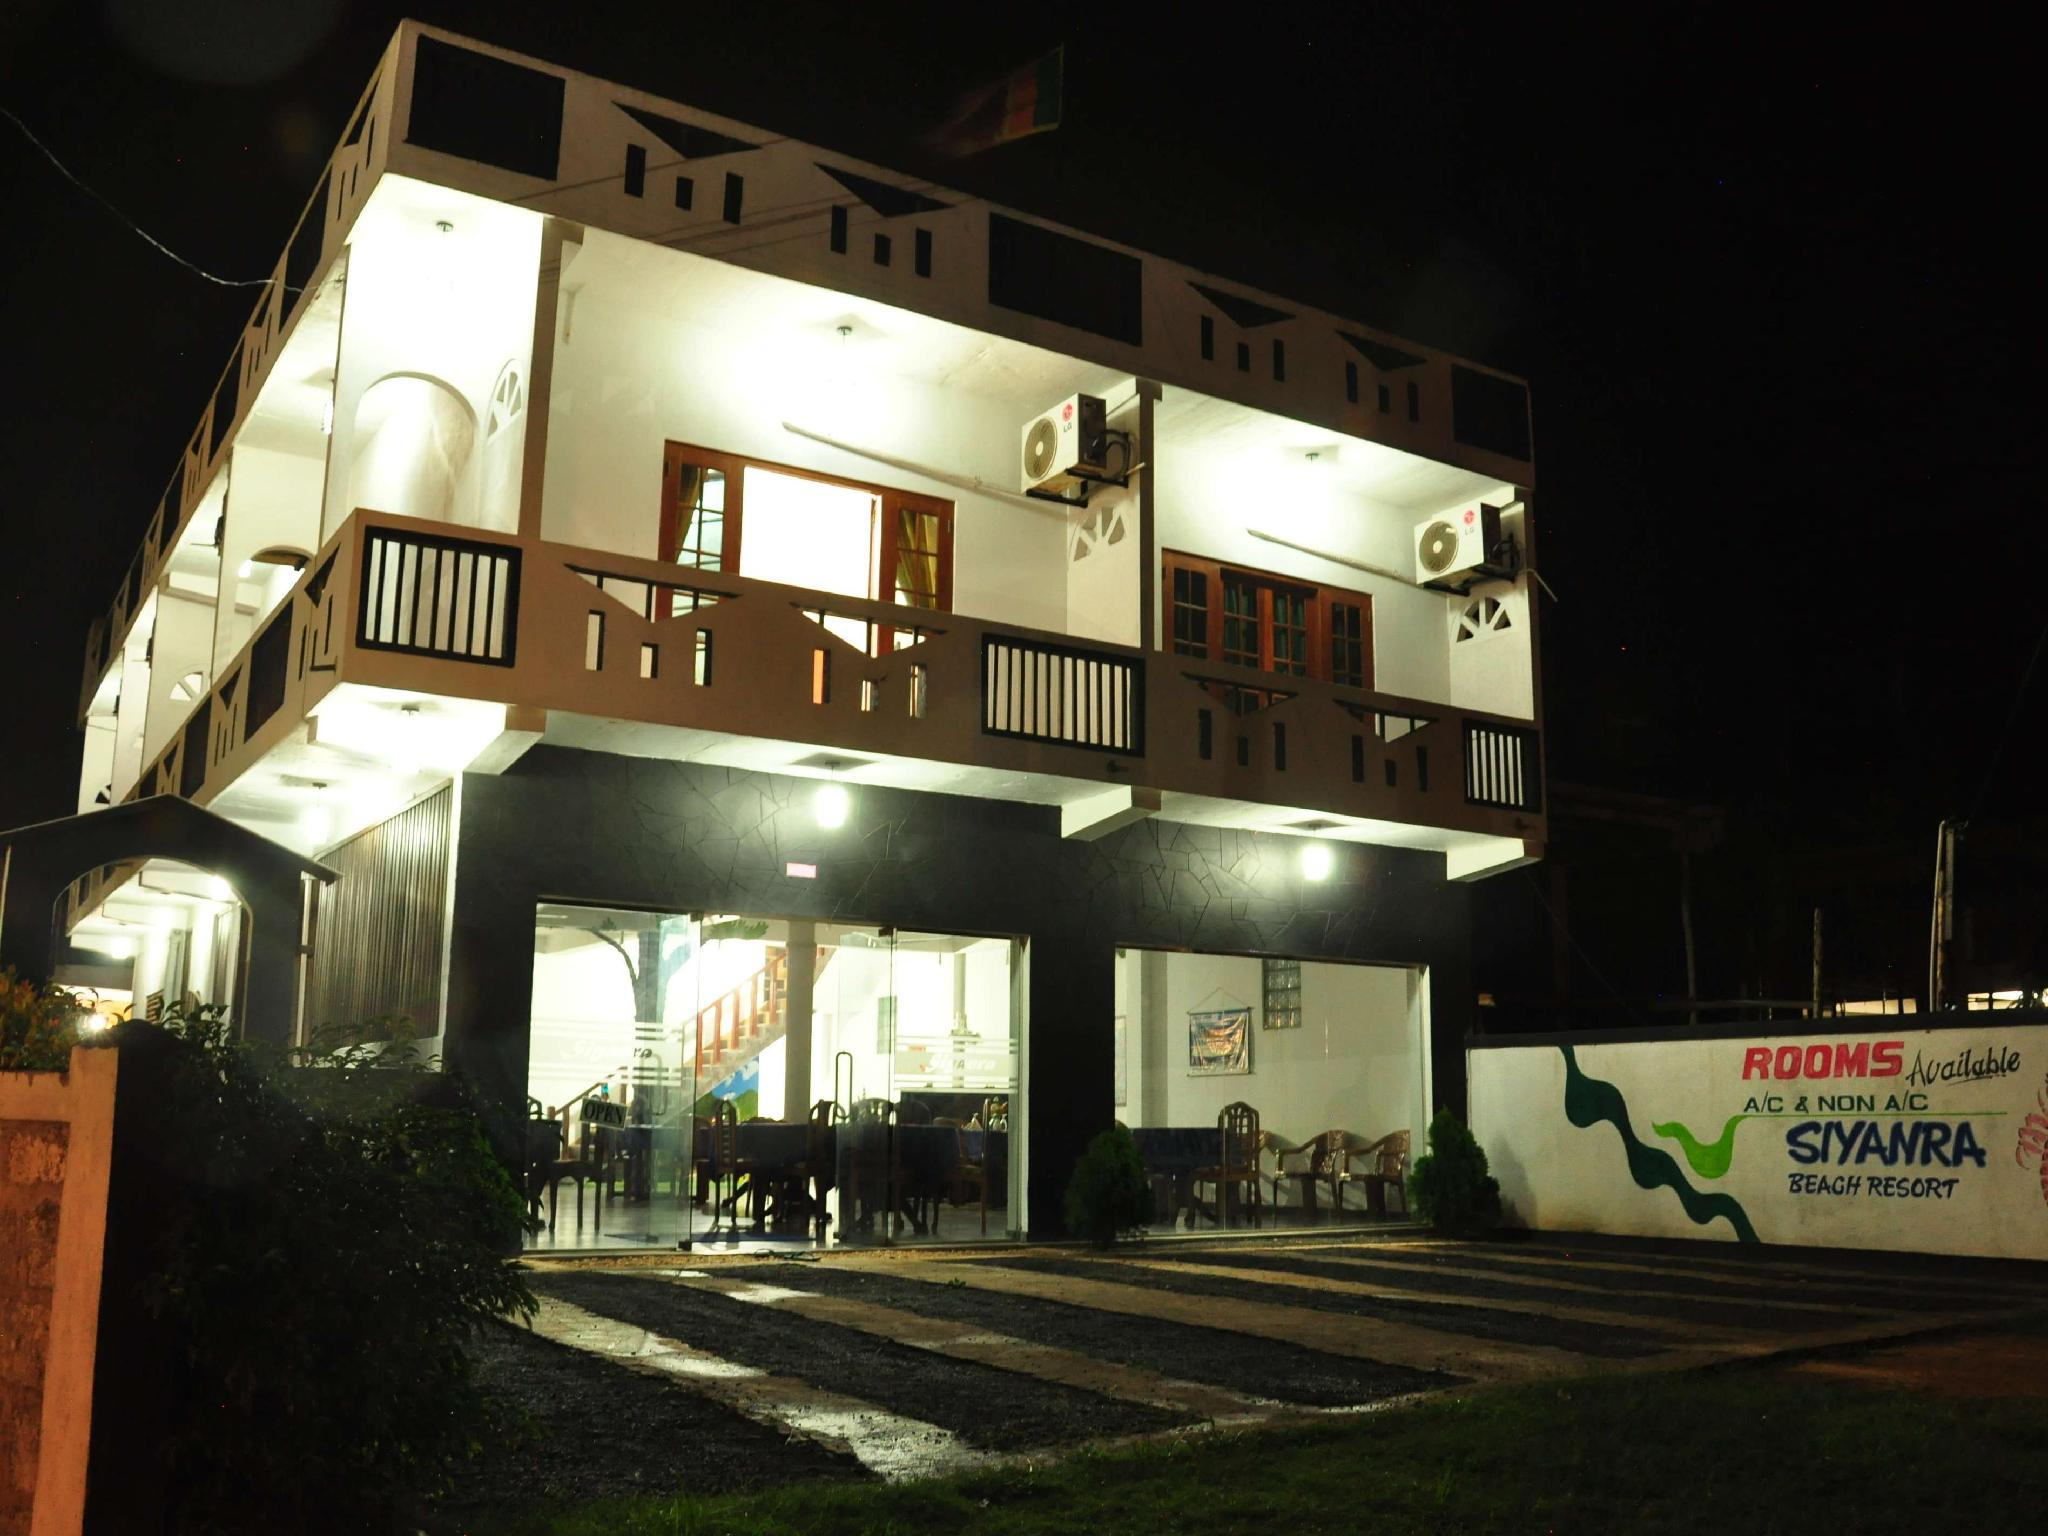 Siyanra Beach Resort